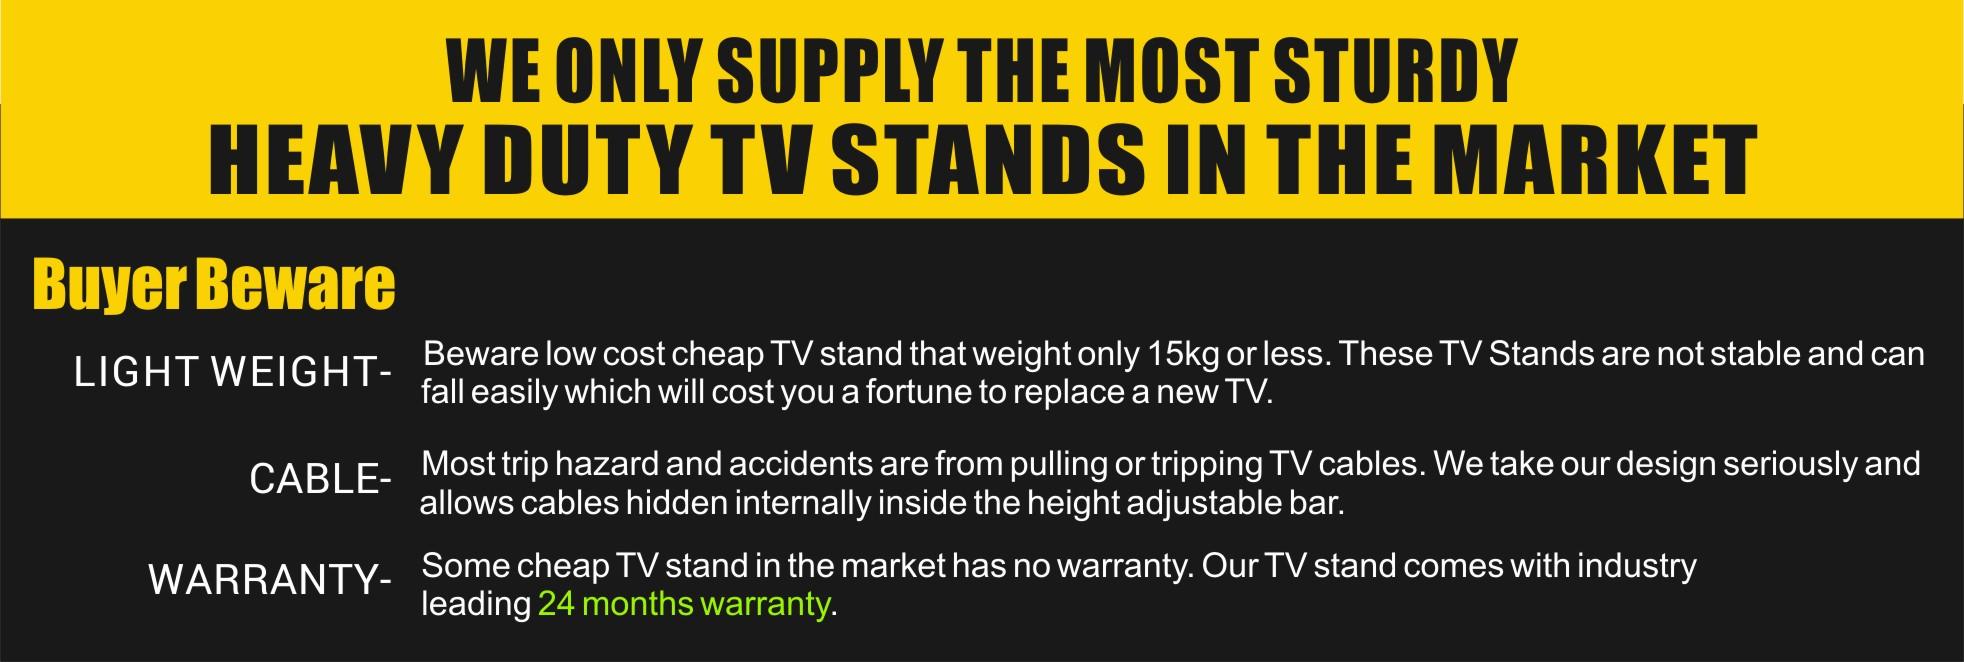 mobile-tv-stand-banner1.jpg